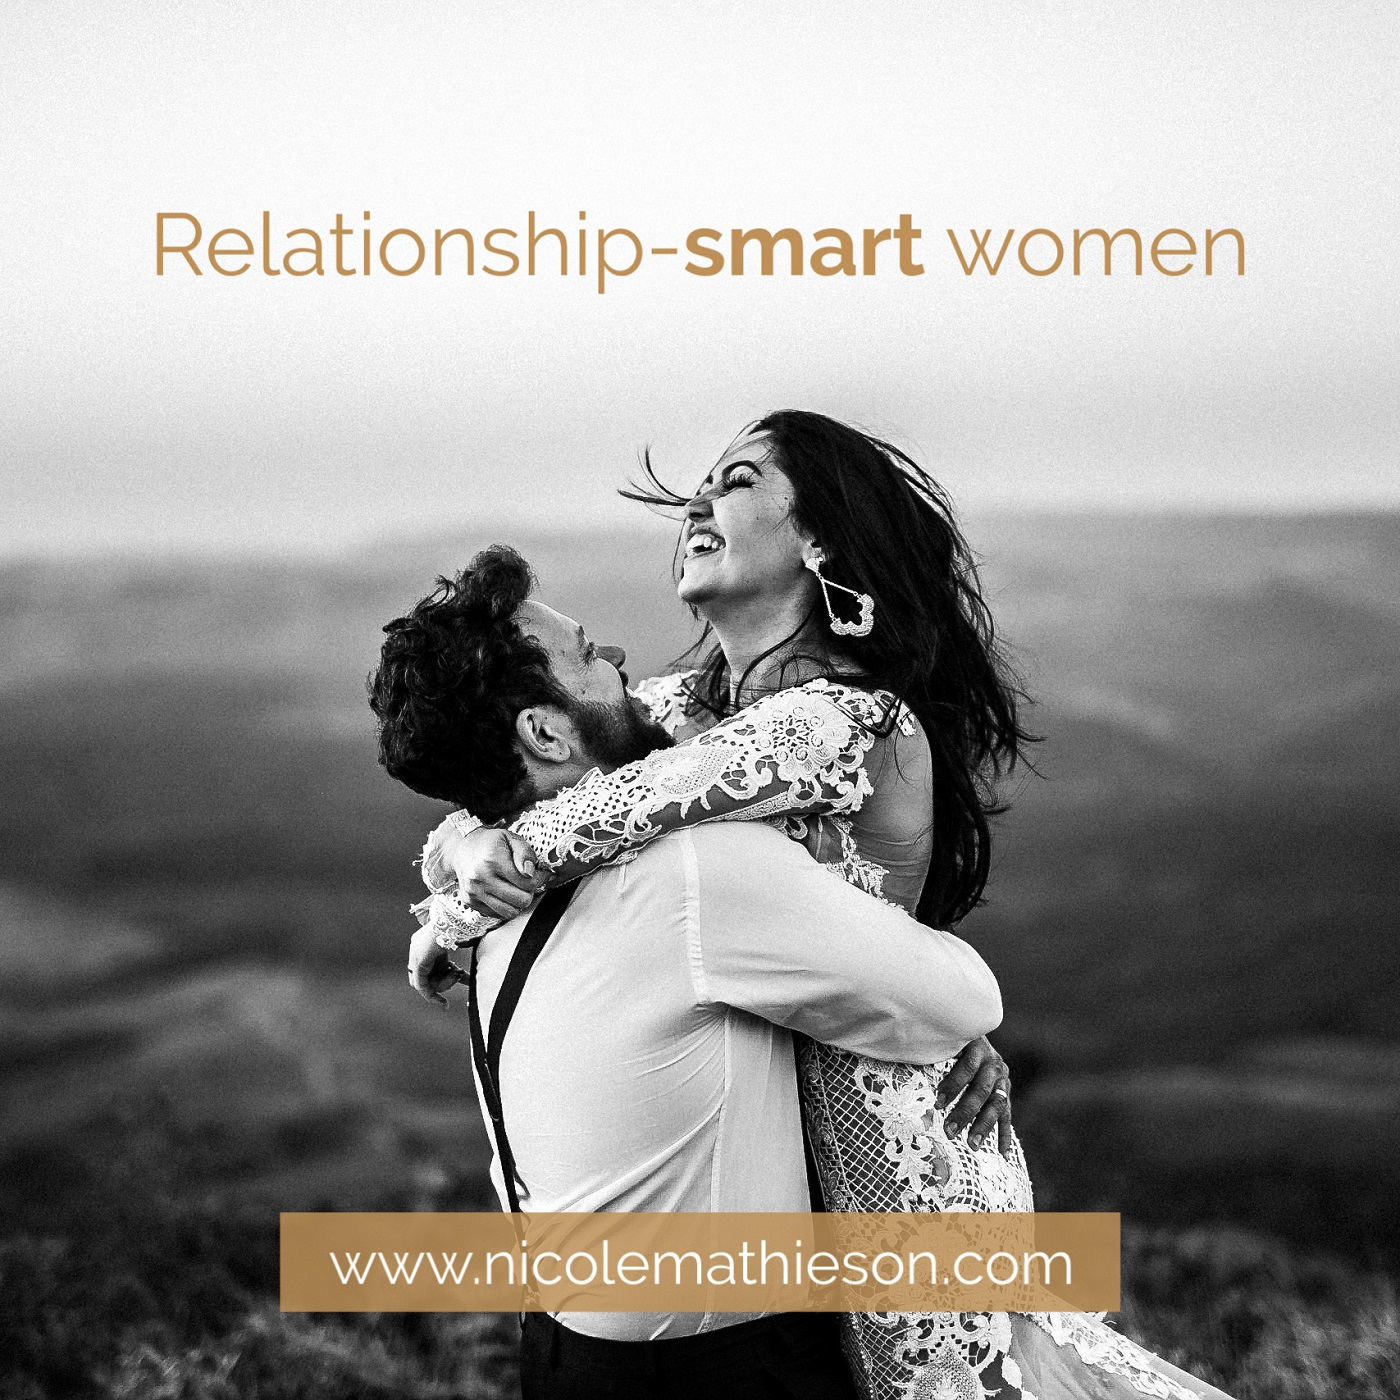 Relationship-smart women podcast show image